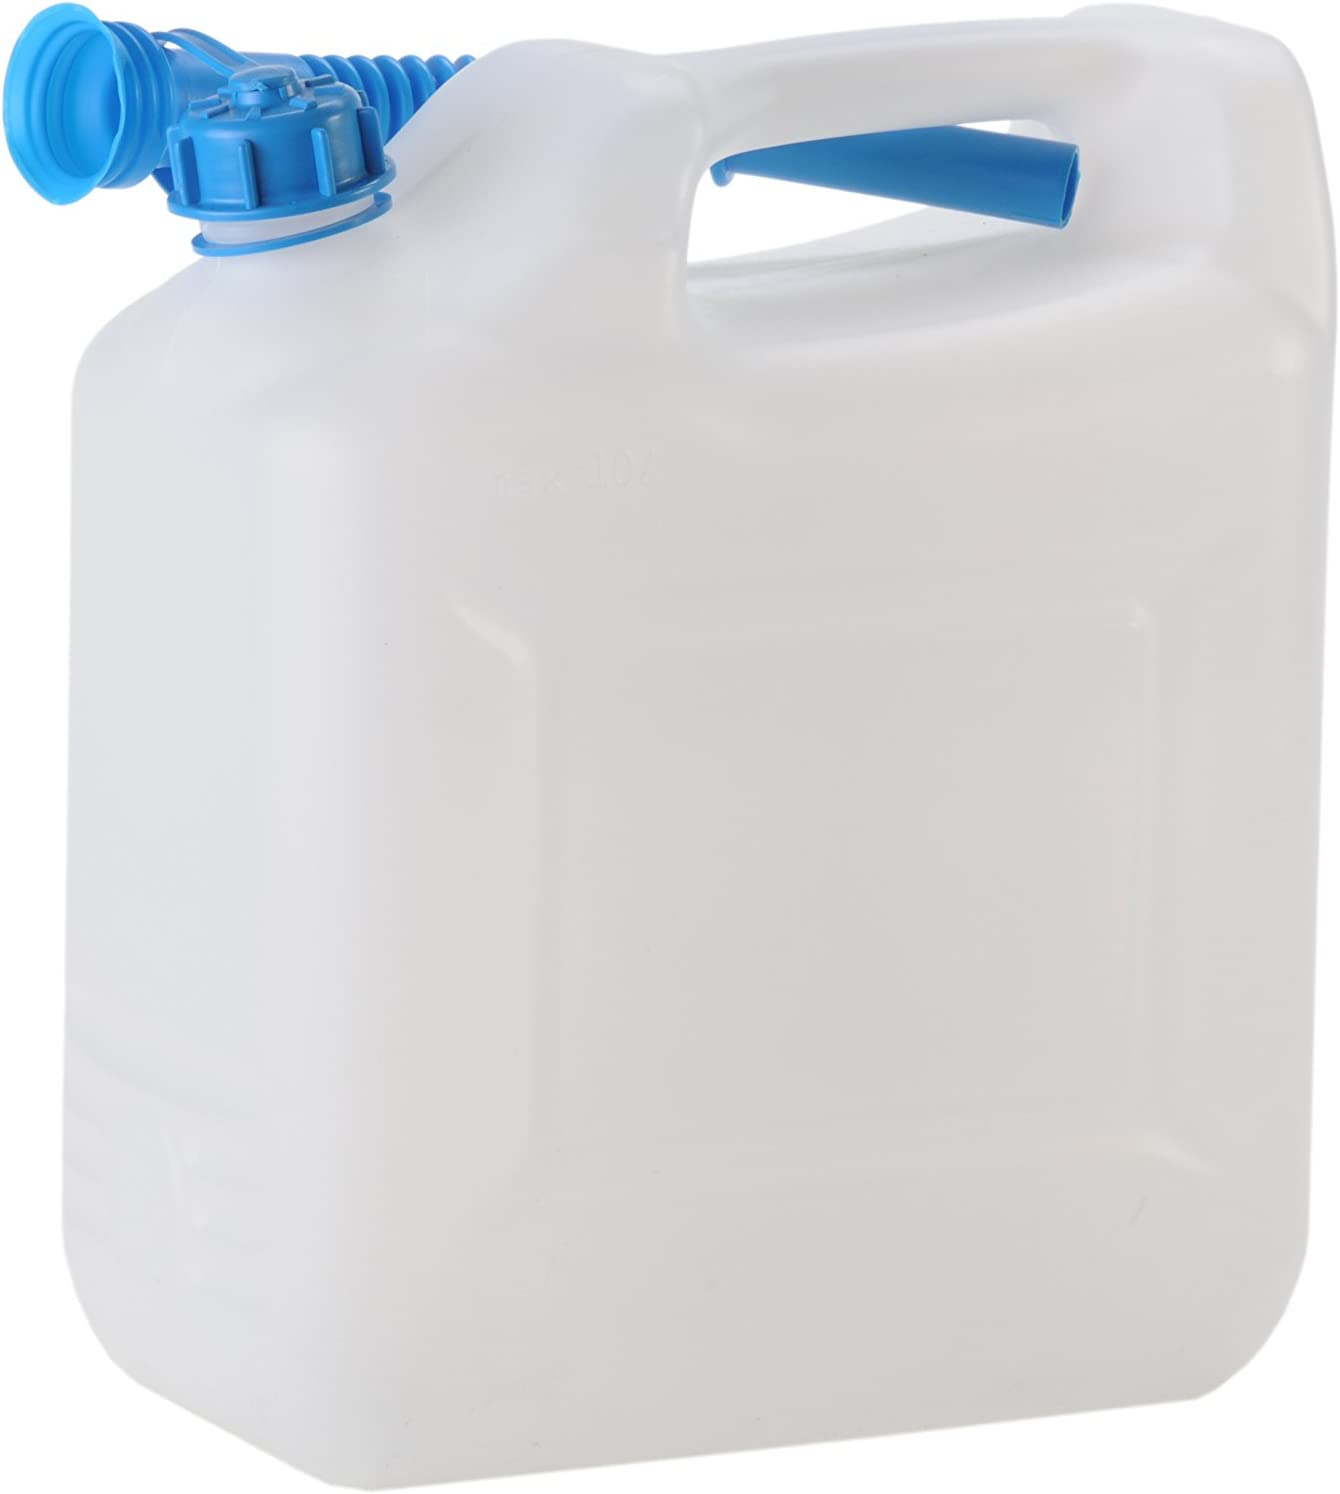 Hünersdorff Bidón para agua ECO 12L con tubo, PEAD Natural, con accesorios azules